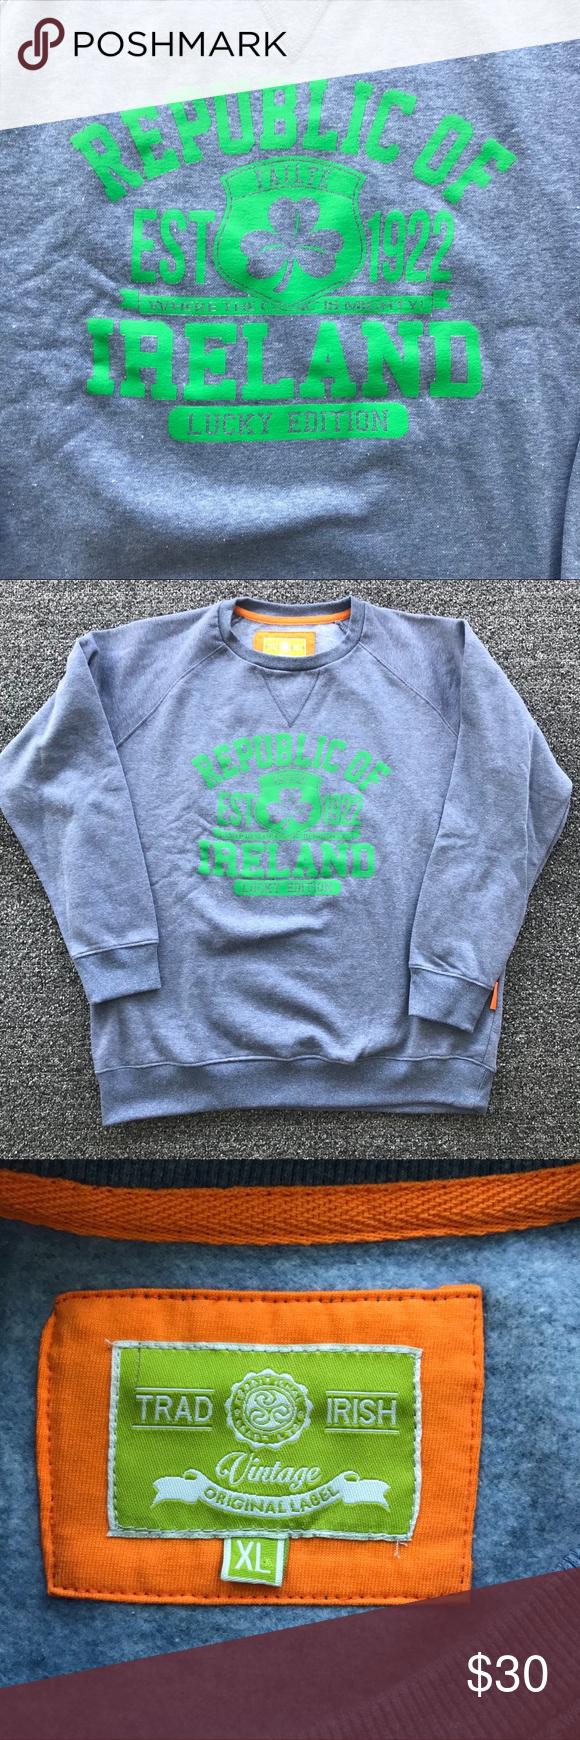 Republic Of Ireland Sweatshirt Sweatshirts Clothes Design Vintage Tops